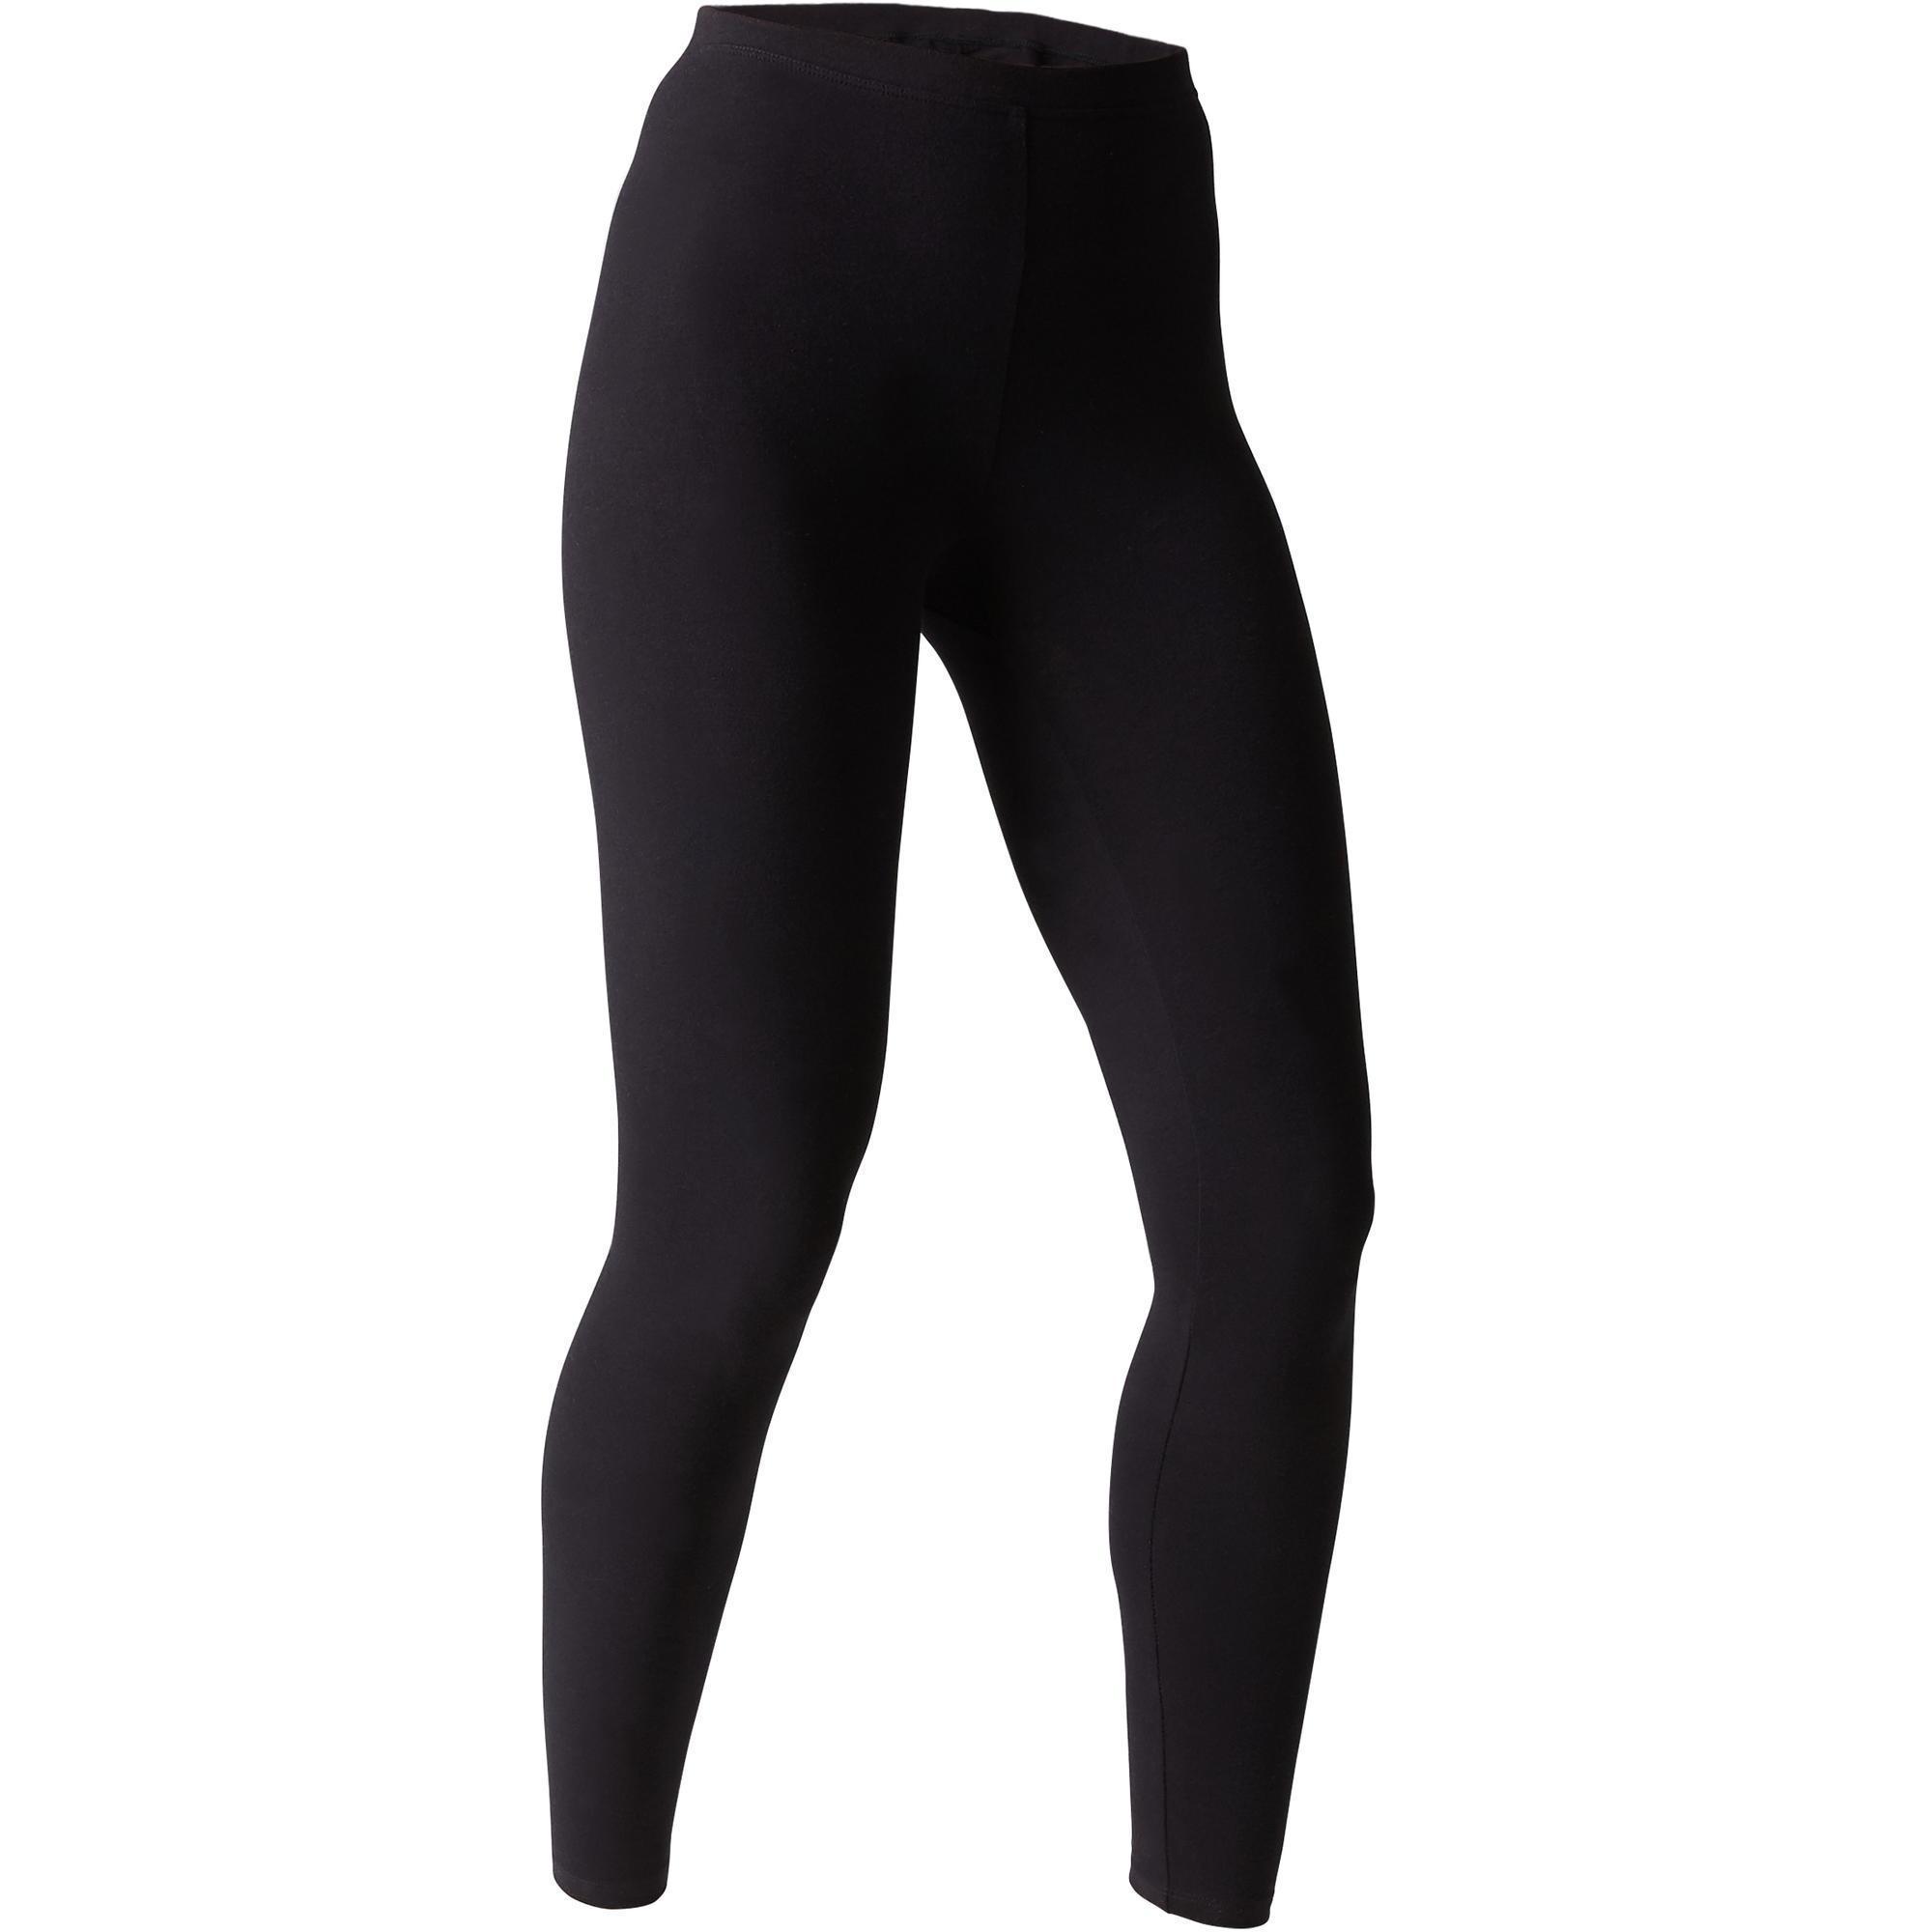 Leggings Stretch Sport Pilates sanfte Gym Damen | Bekleidung > Hosen > Leggings | Nyamba